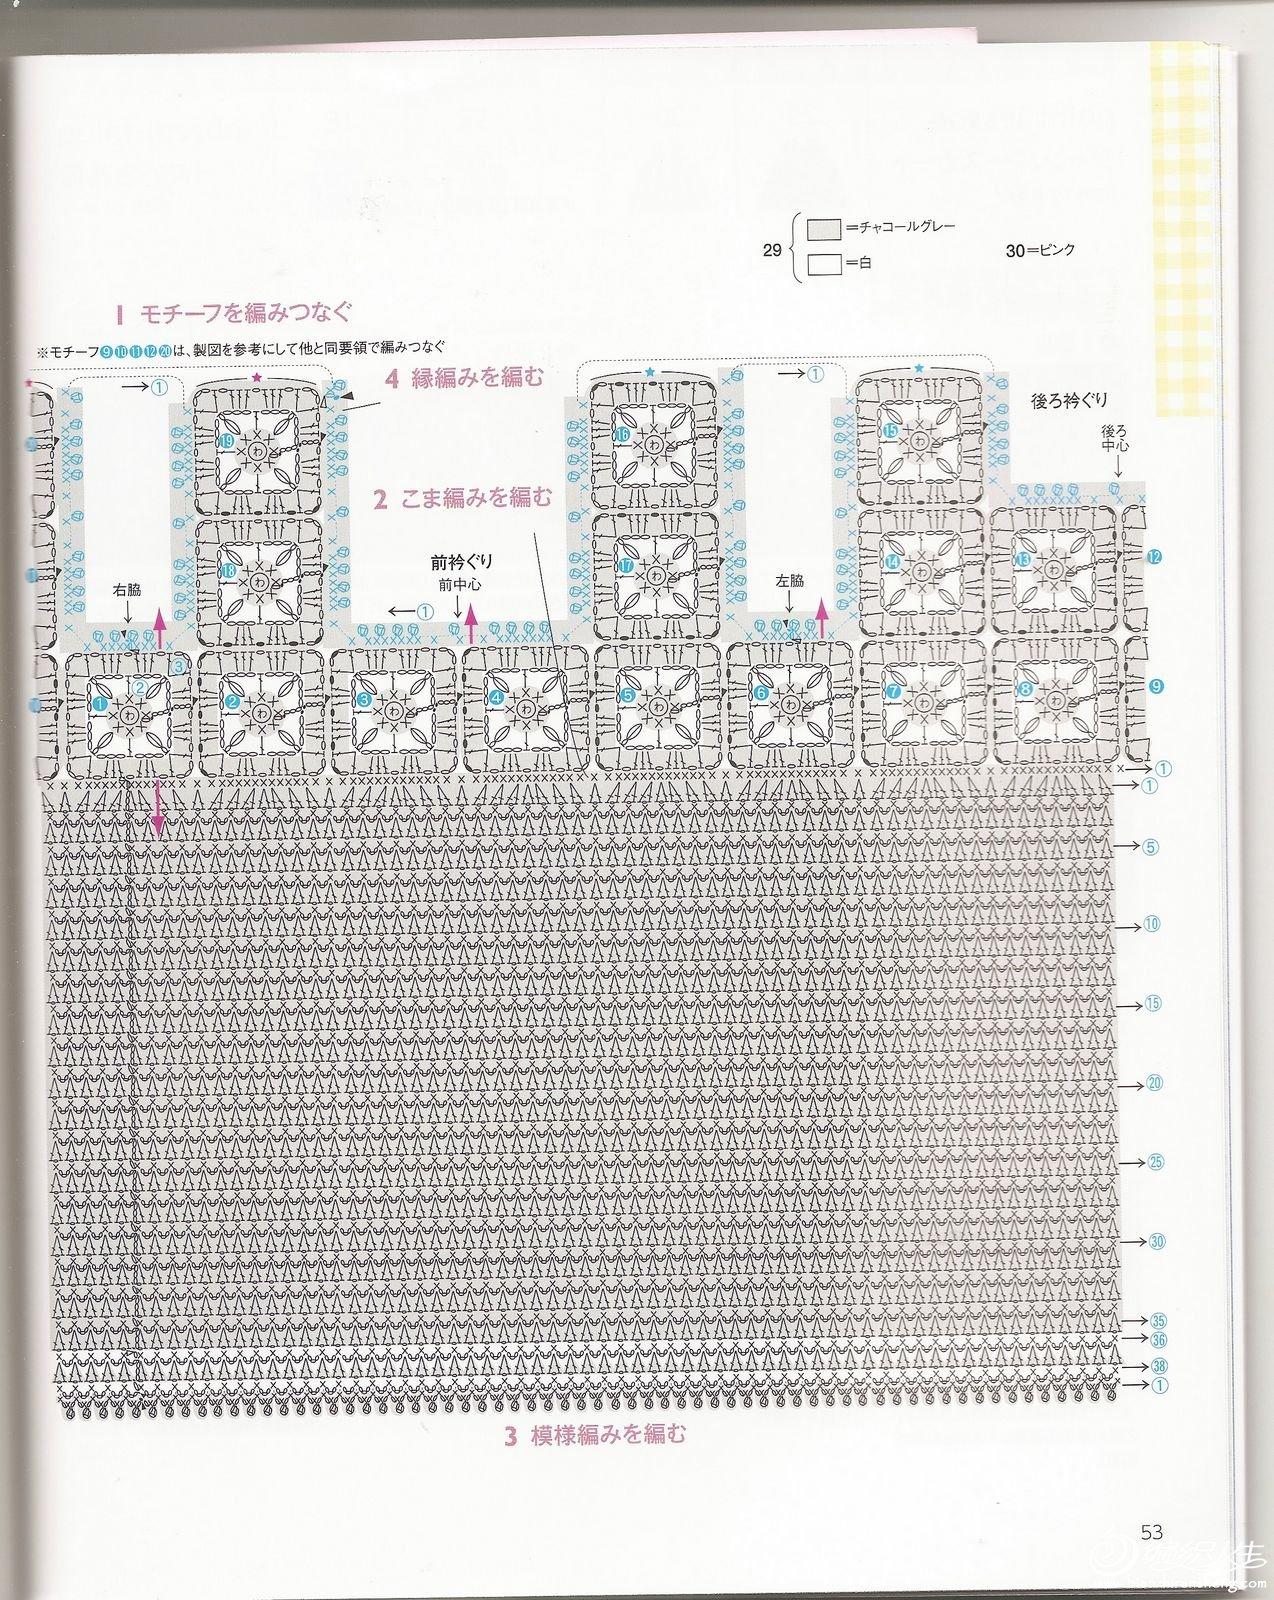 538976baxa5b7c718b3ae&690.jpg